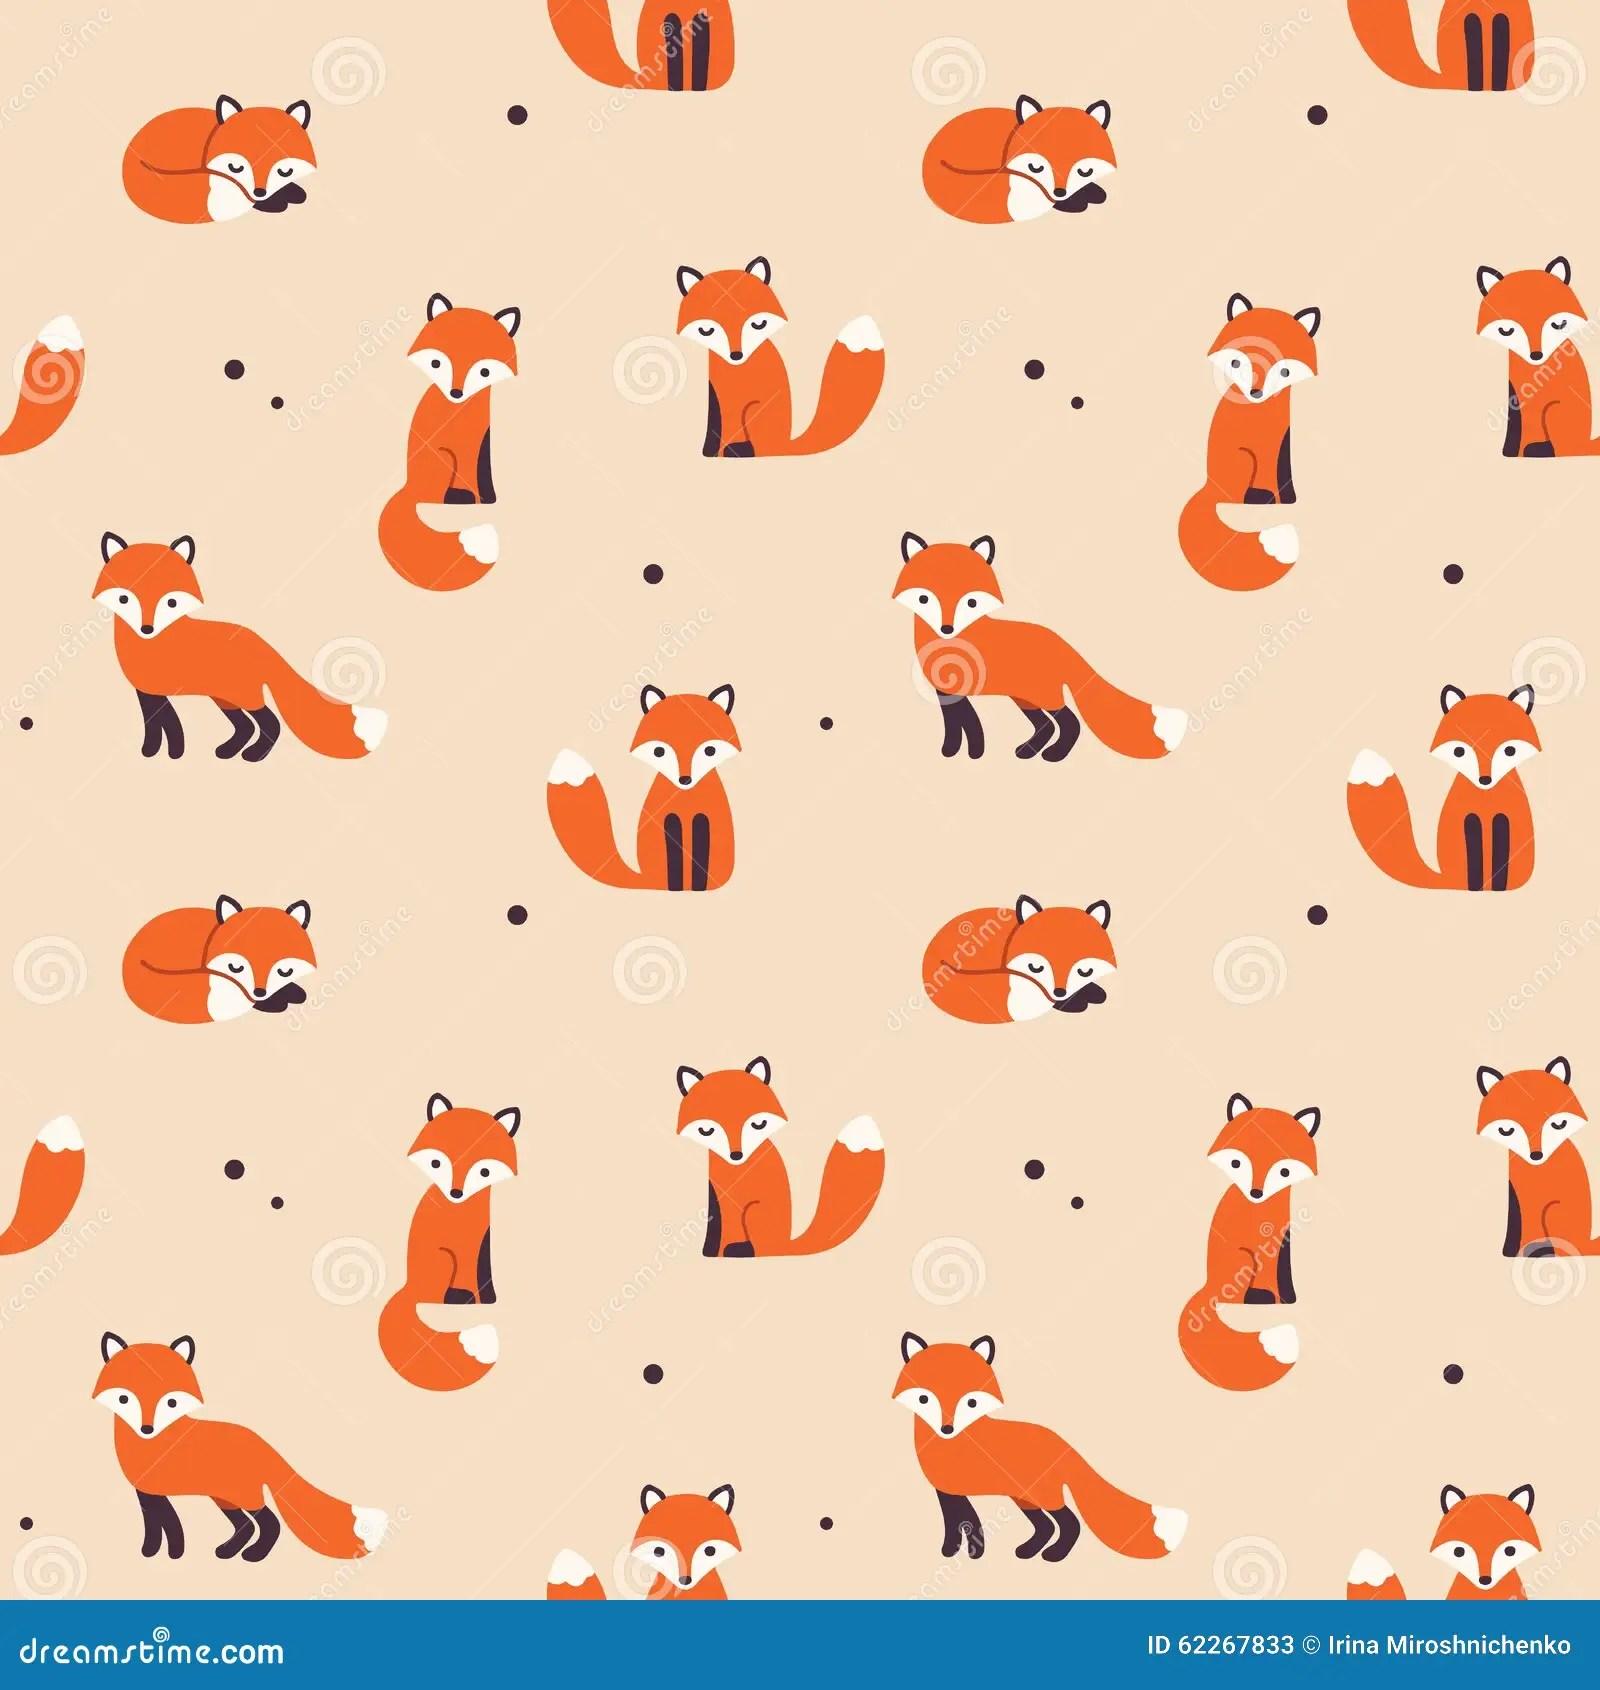 Fall Patterns Wallpaper Seamless Fox Pattern Stock Vector Illustration Of Orange